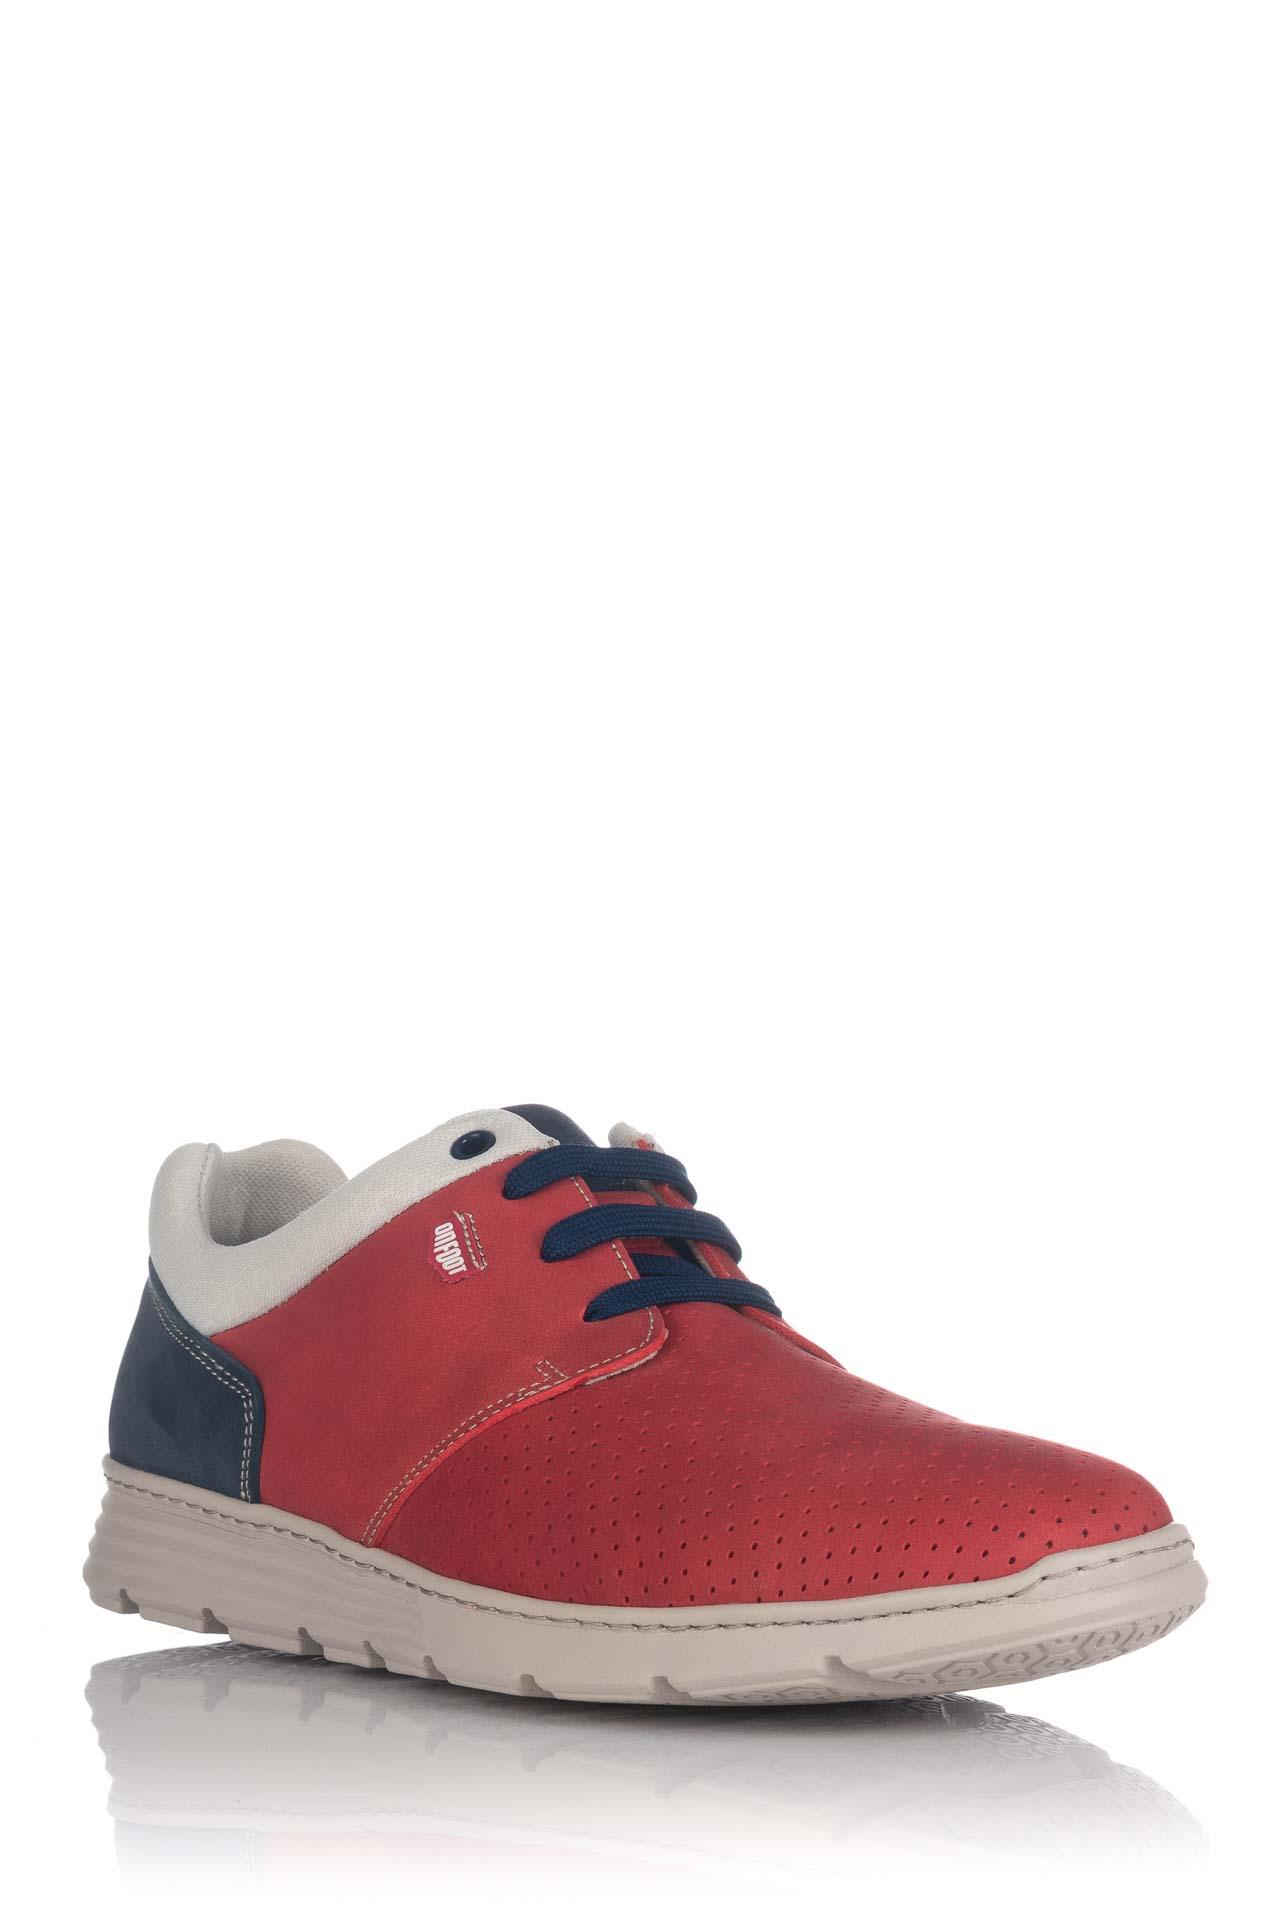 Zapatos On Foot 3500 Teja